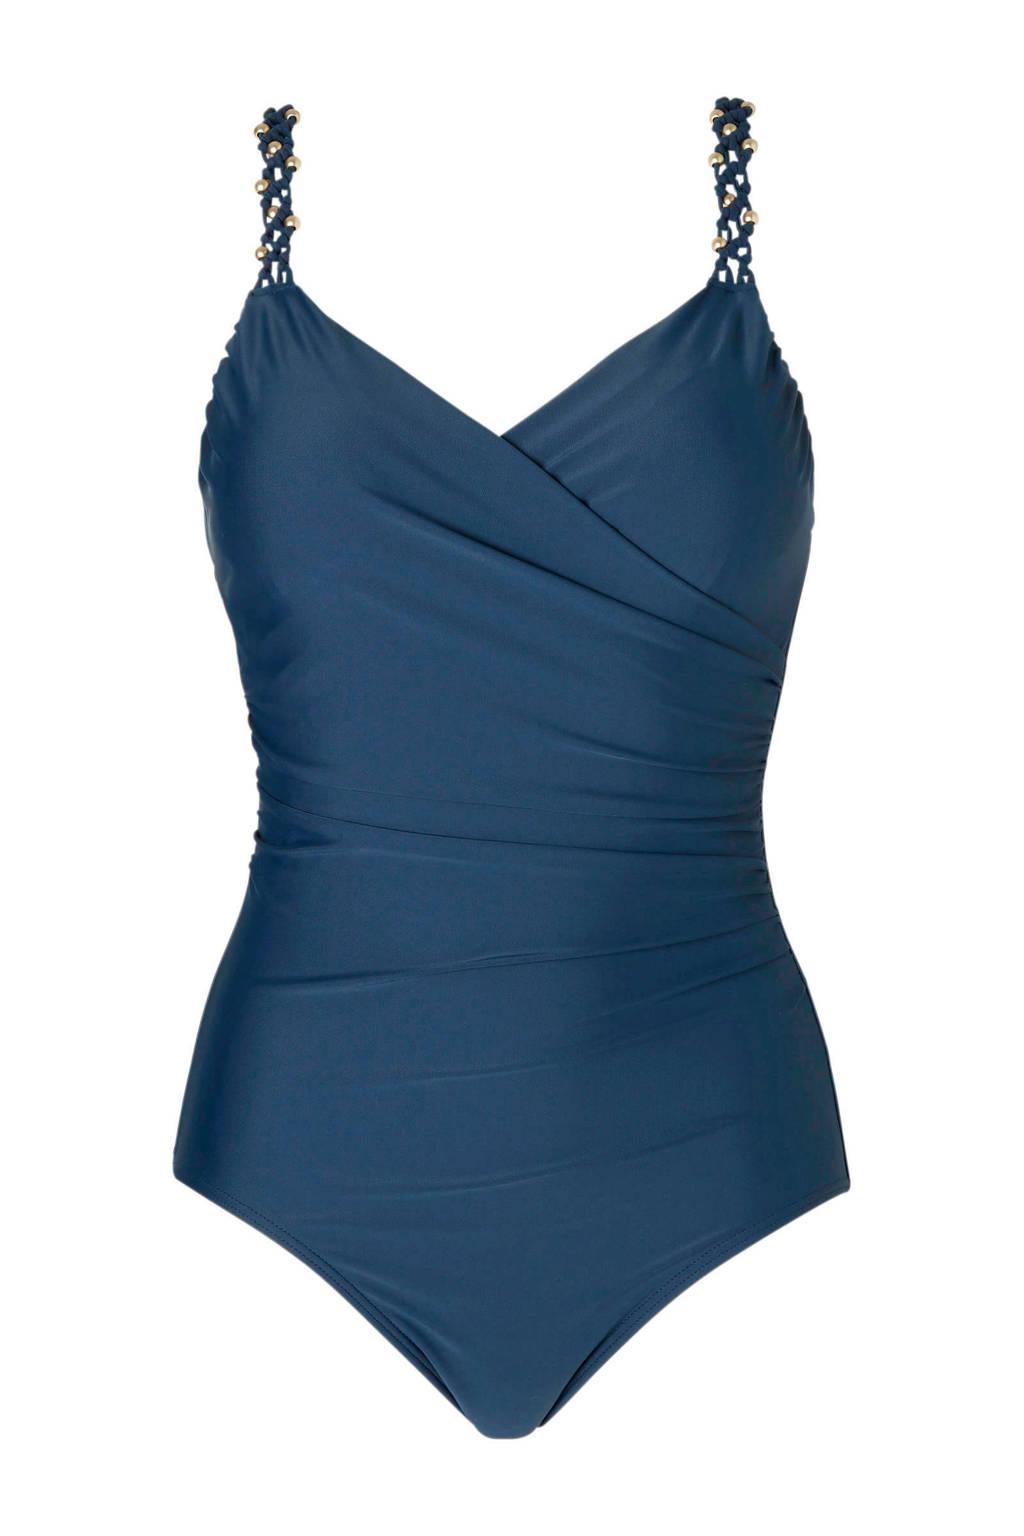 whkmp's beachwave corrigerend badpak met plooien blauw, Blauw